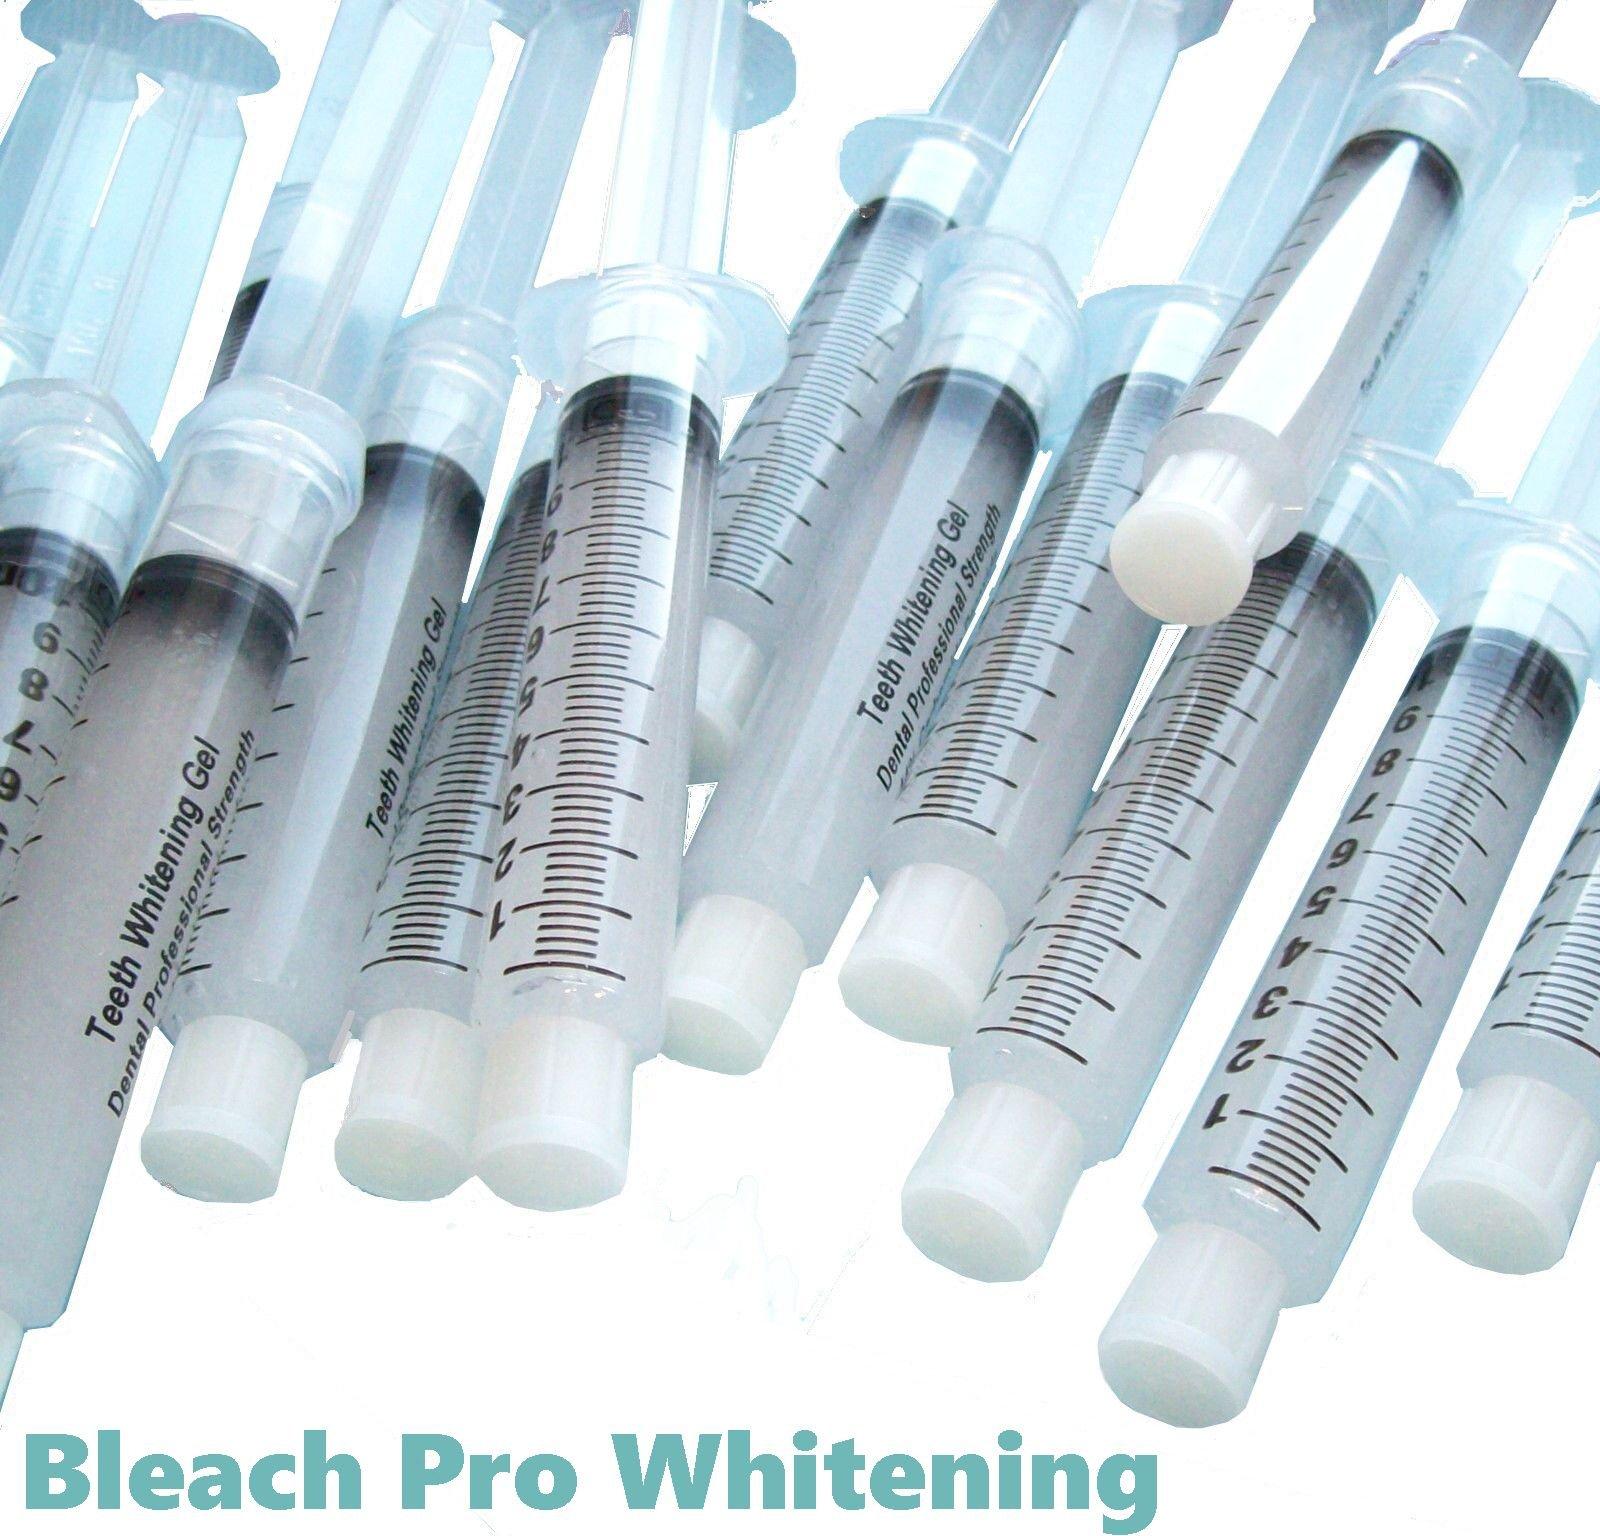 50 Teeth Whitening Gel 22% Carbamide Peroxide 10ml Syringes